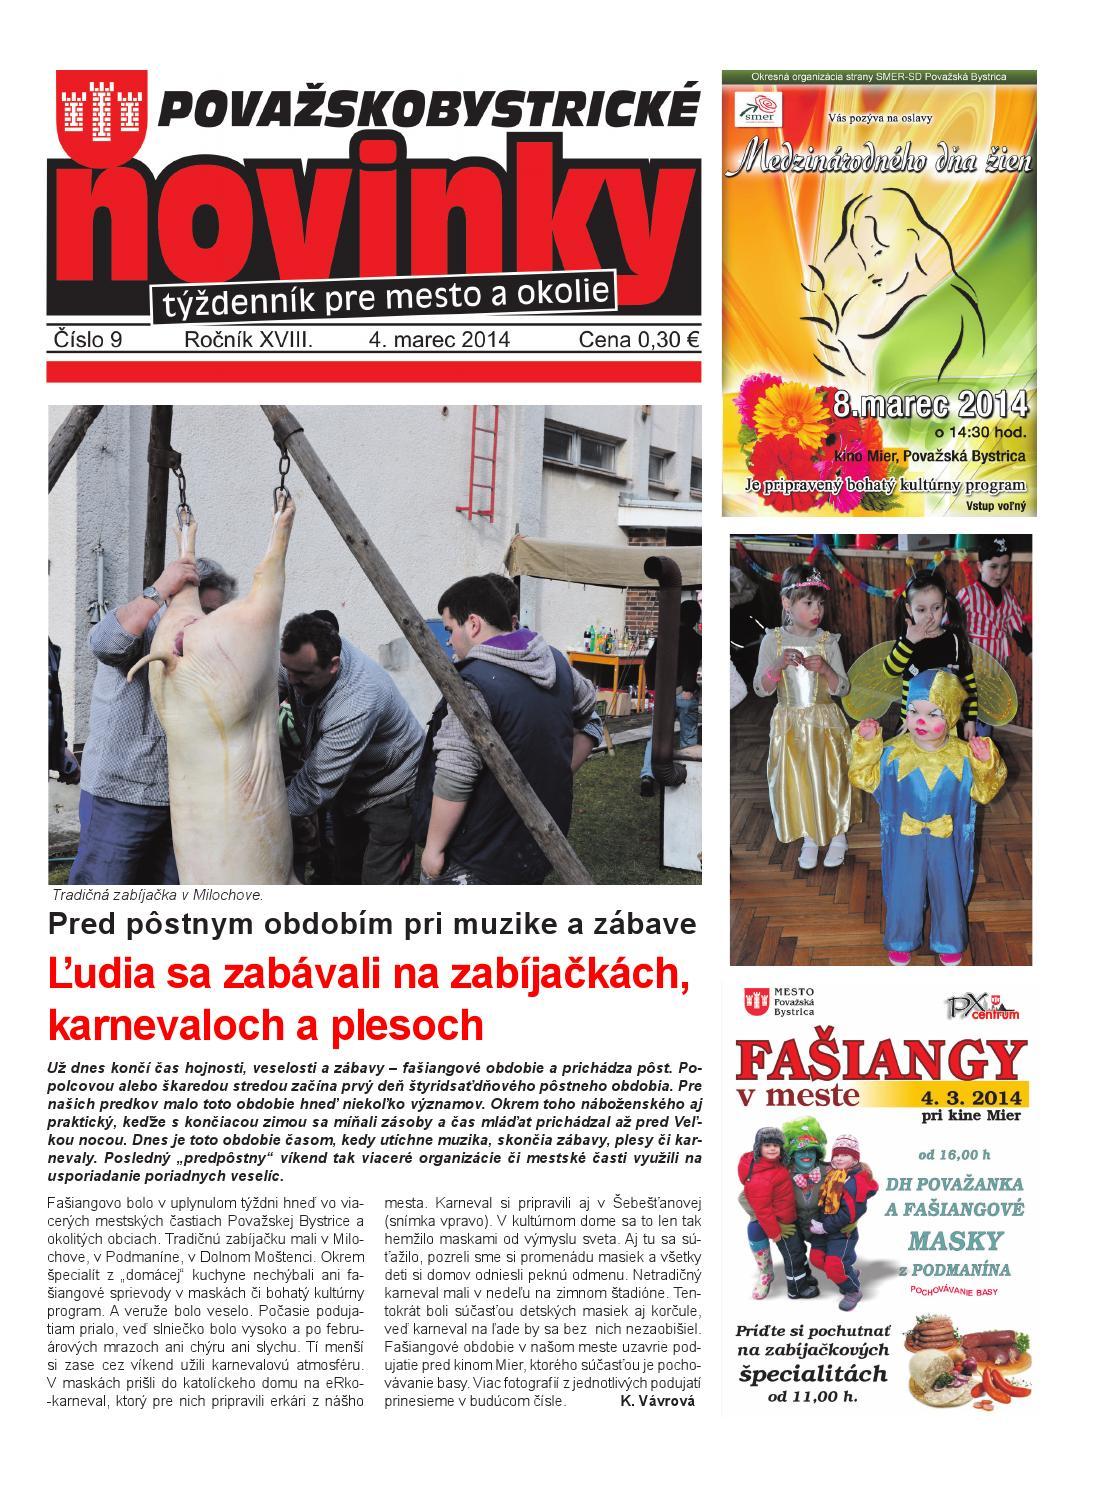 361a092f6dca7 PB novinky_09 / 04.03.2014 by Karol Janas - issuu